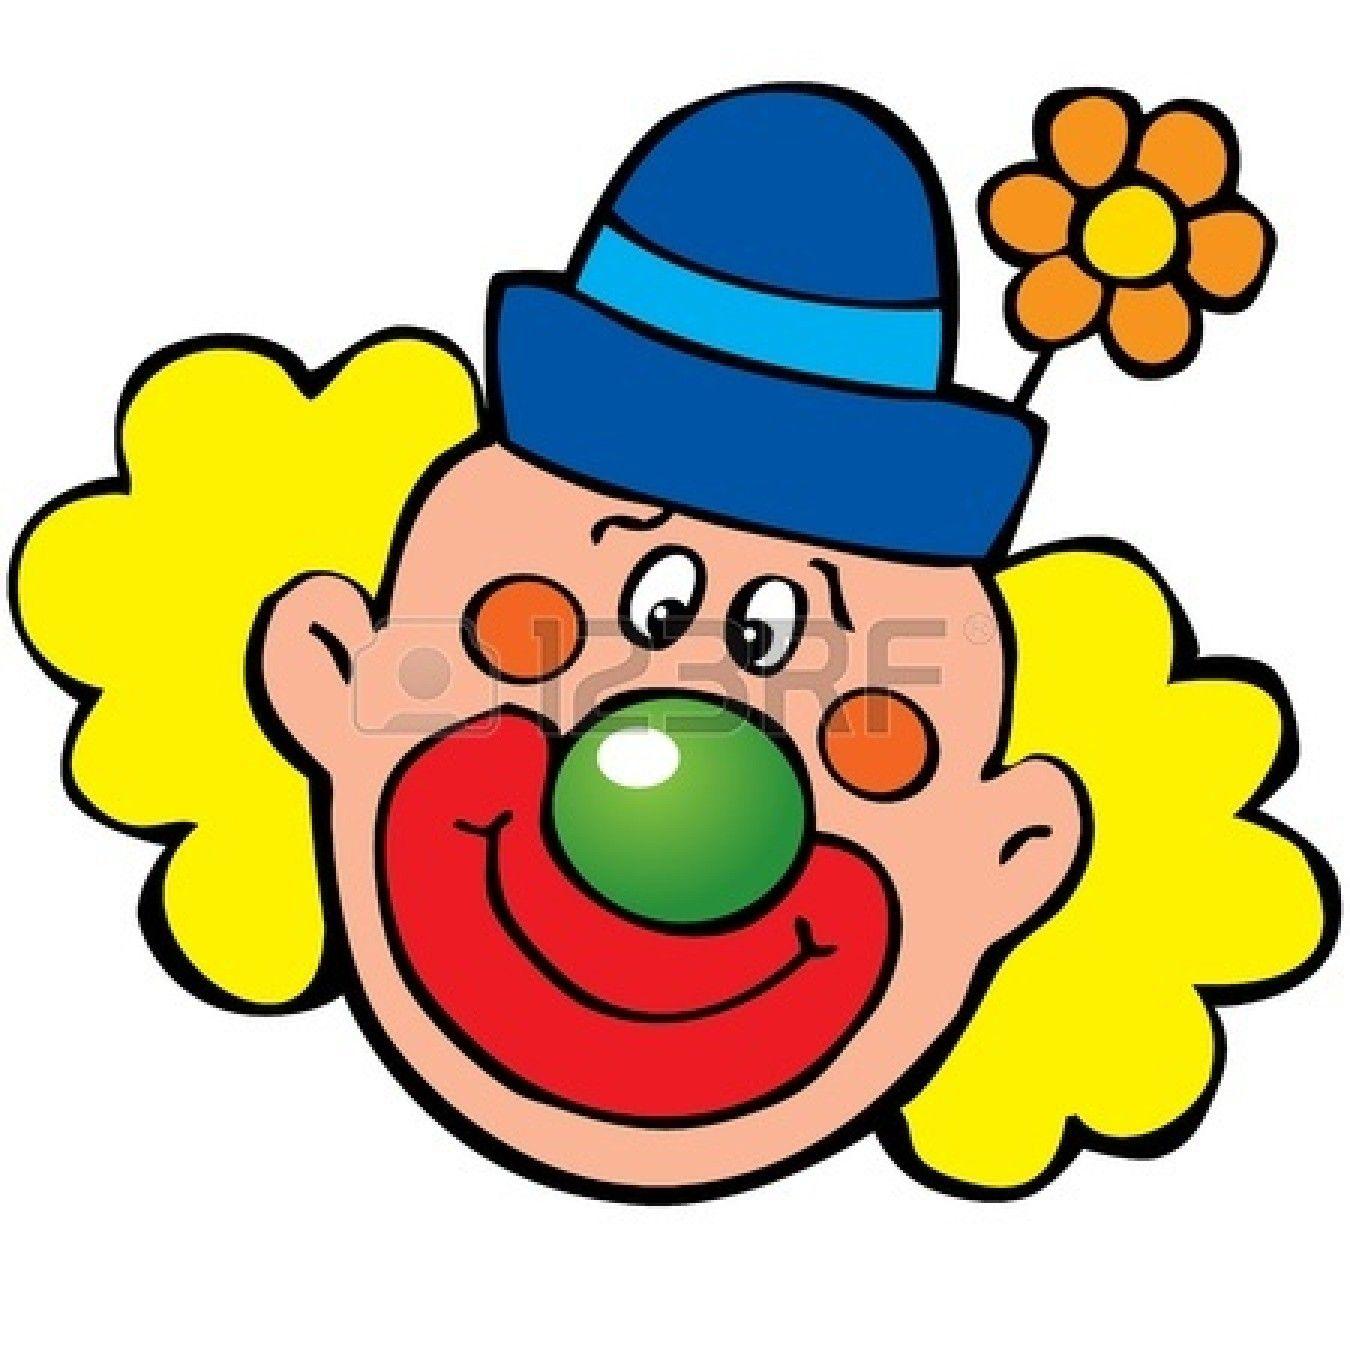 Clown Face Clip Art Clown Clip Art 15067566 Happy Clown Art Illustration On A White Clip Art Doll Drawing Free Clip Art